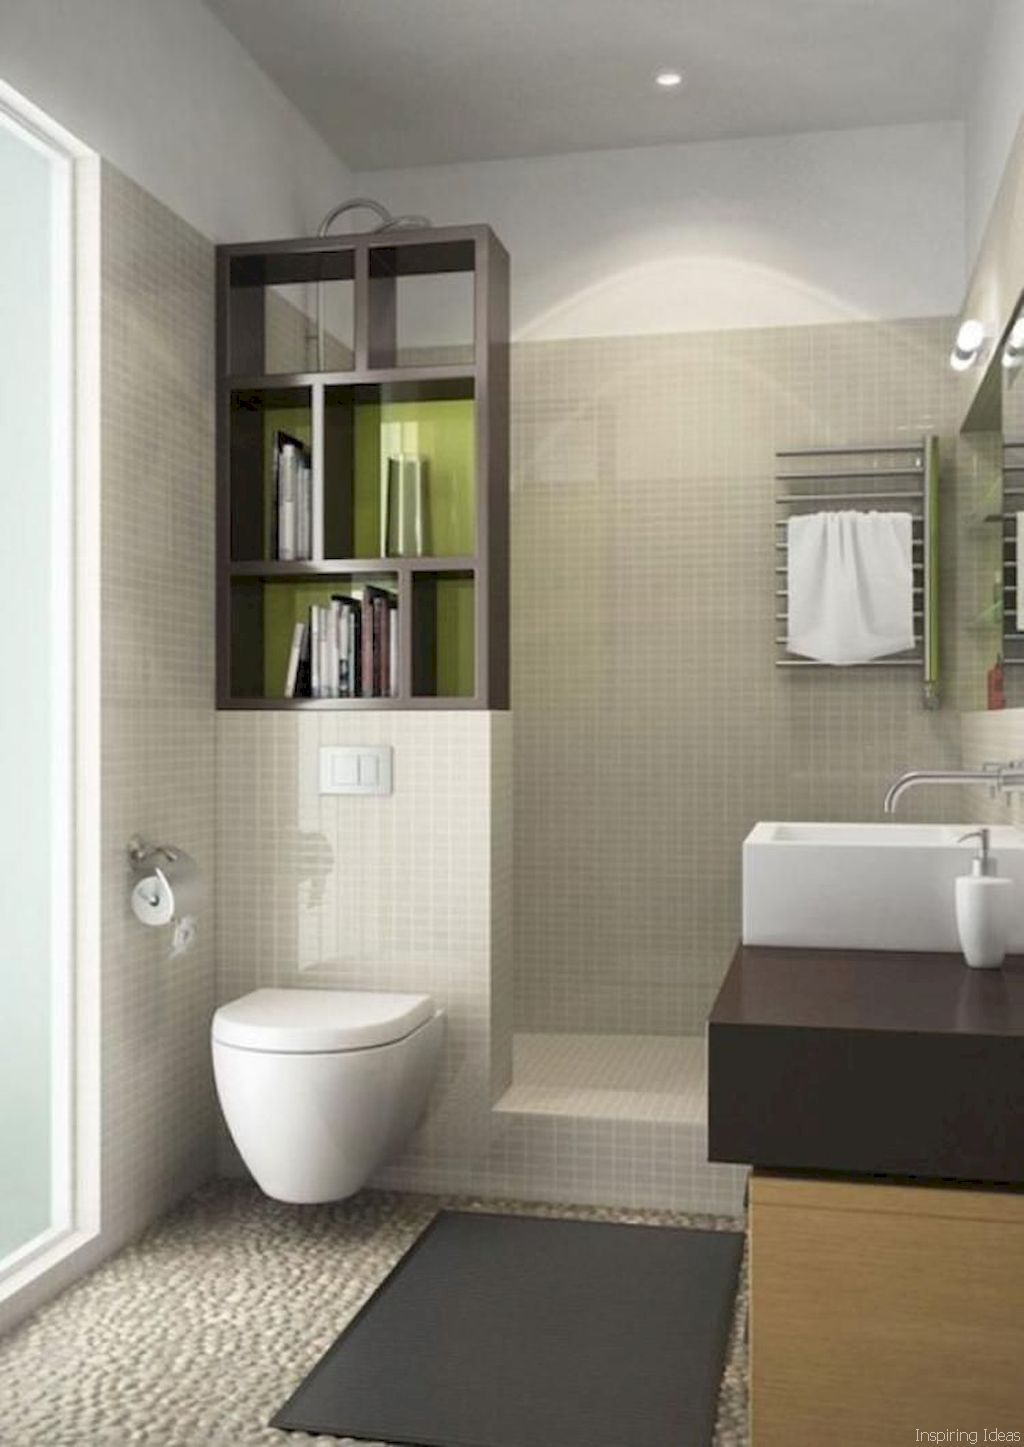 incredible bathroom shower tile design ideas 50 bathroom on cool small bathroom design ideas id=23958